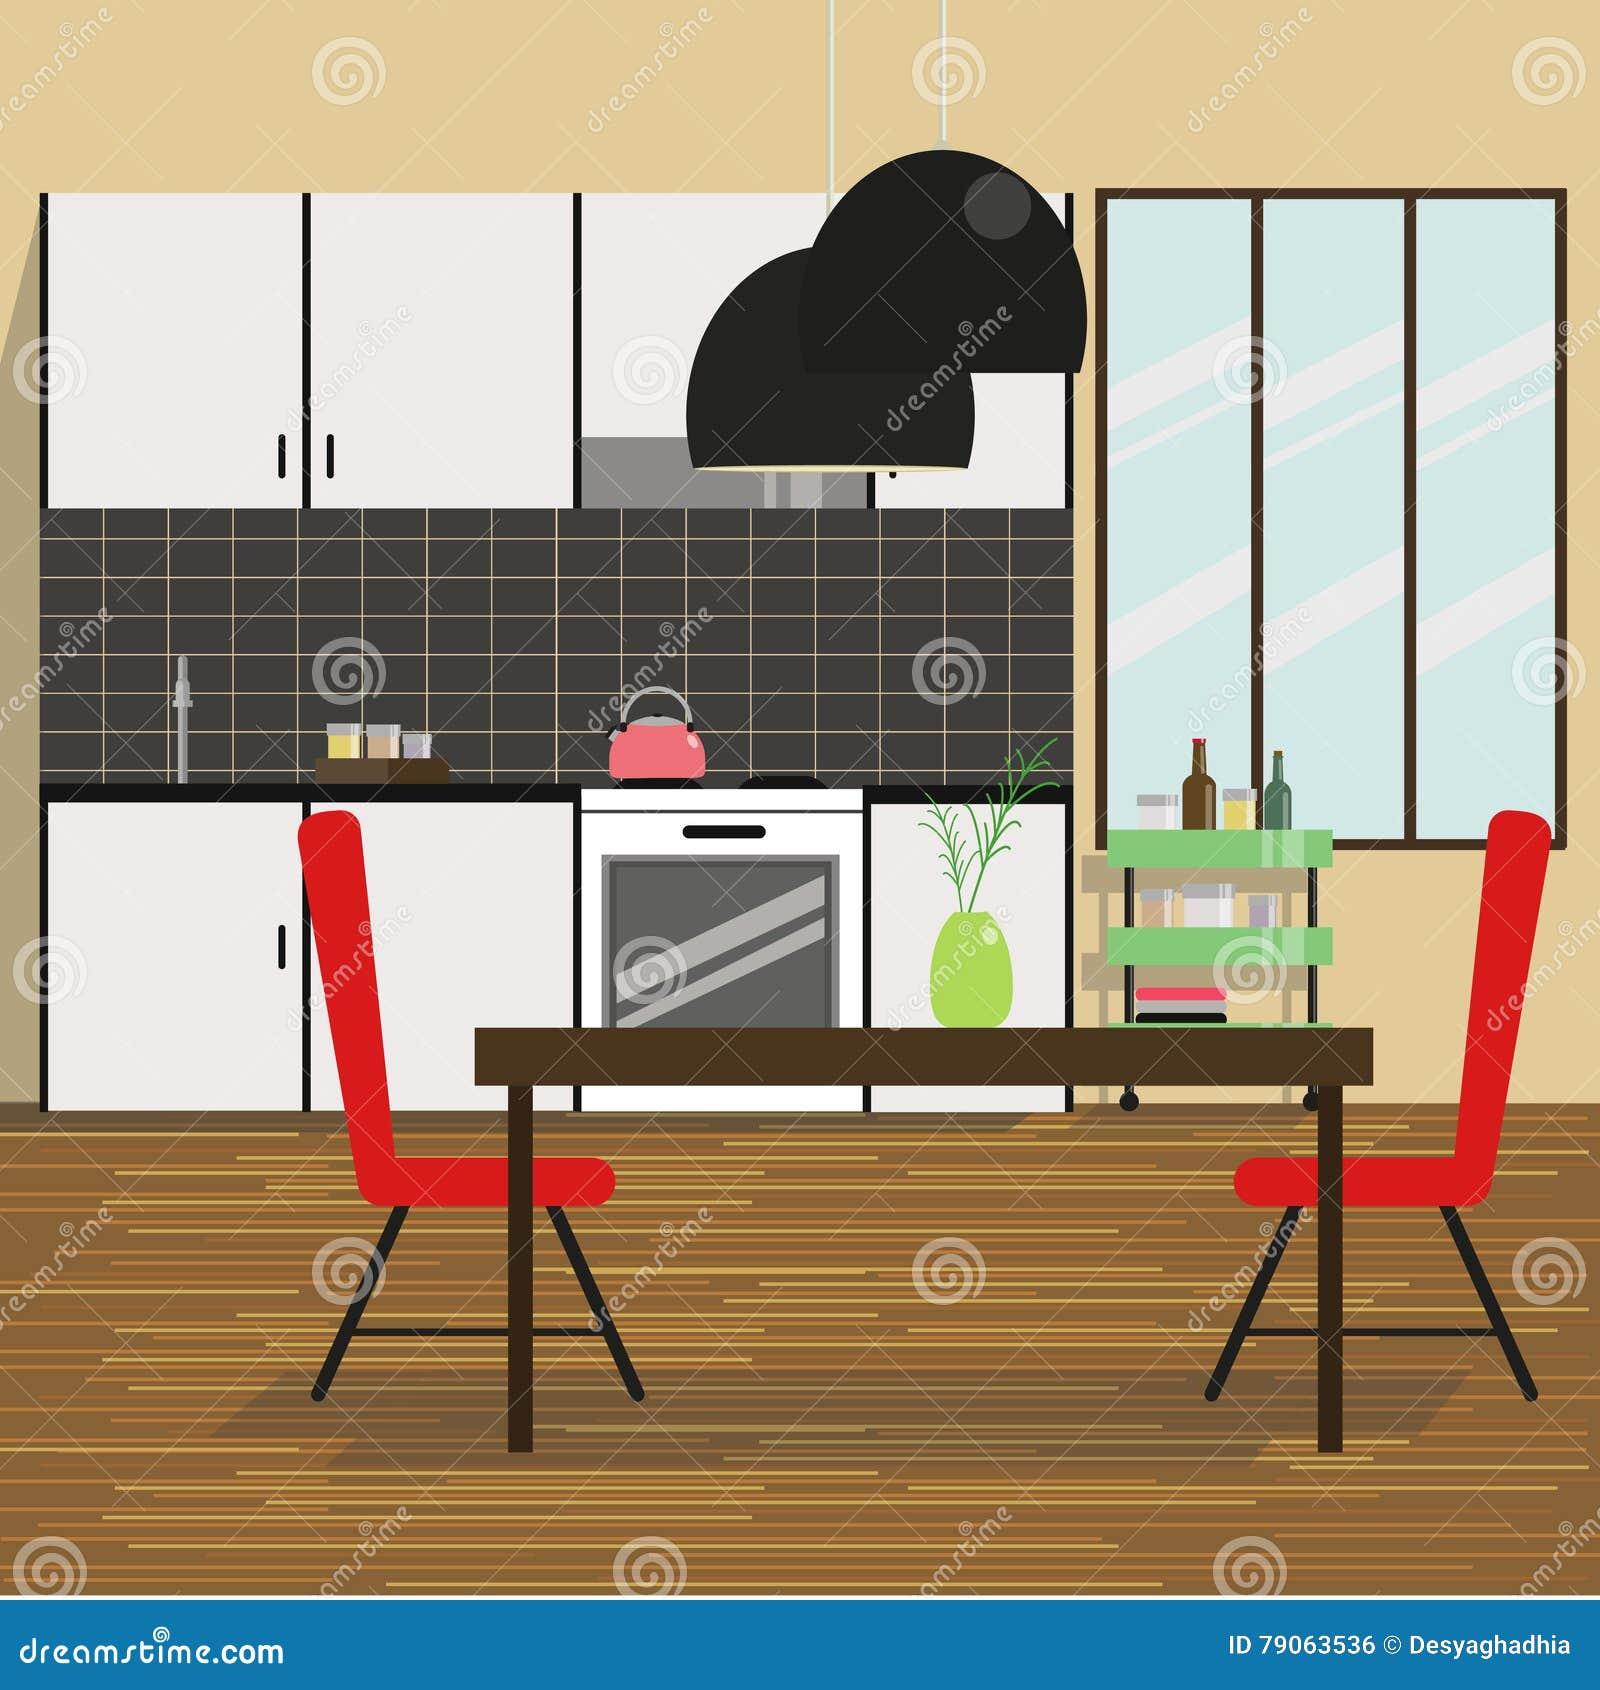 Kitchen Interior Stock Vector Illustration Of Isolated 79063536